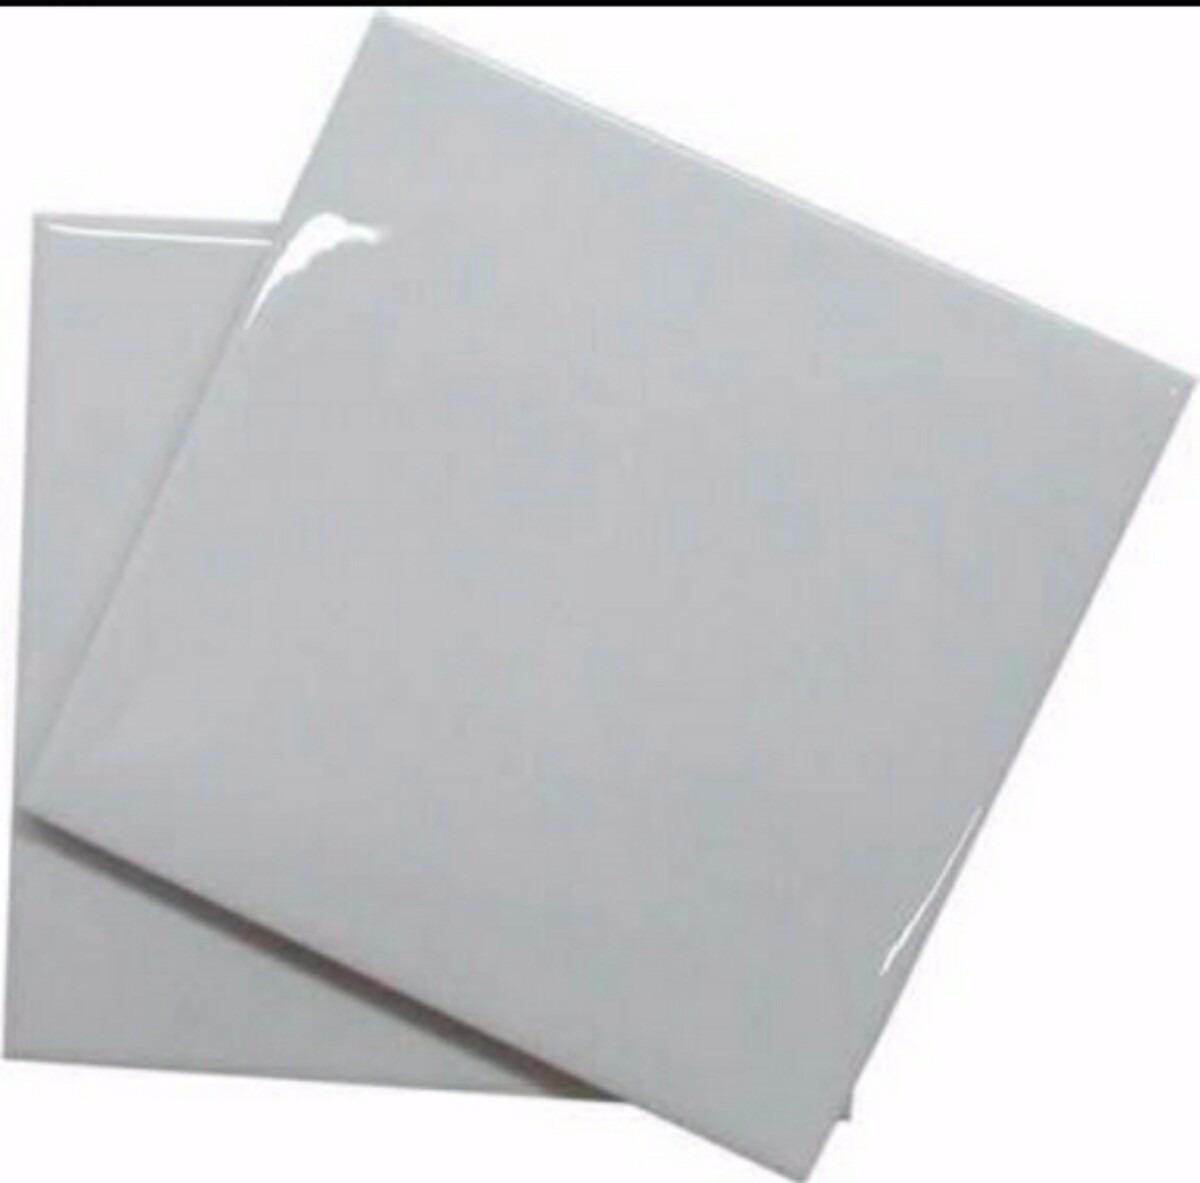 15 azulejo para sublima o branco 15x15 suporte r 89 for Azulejo 15x15